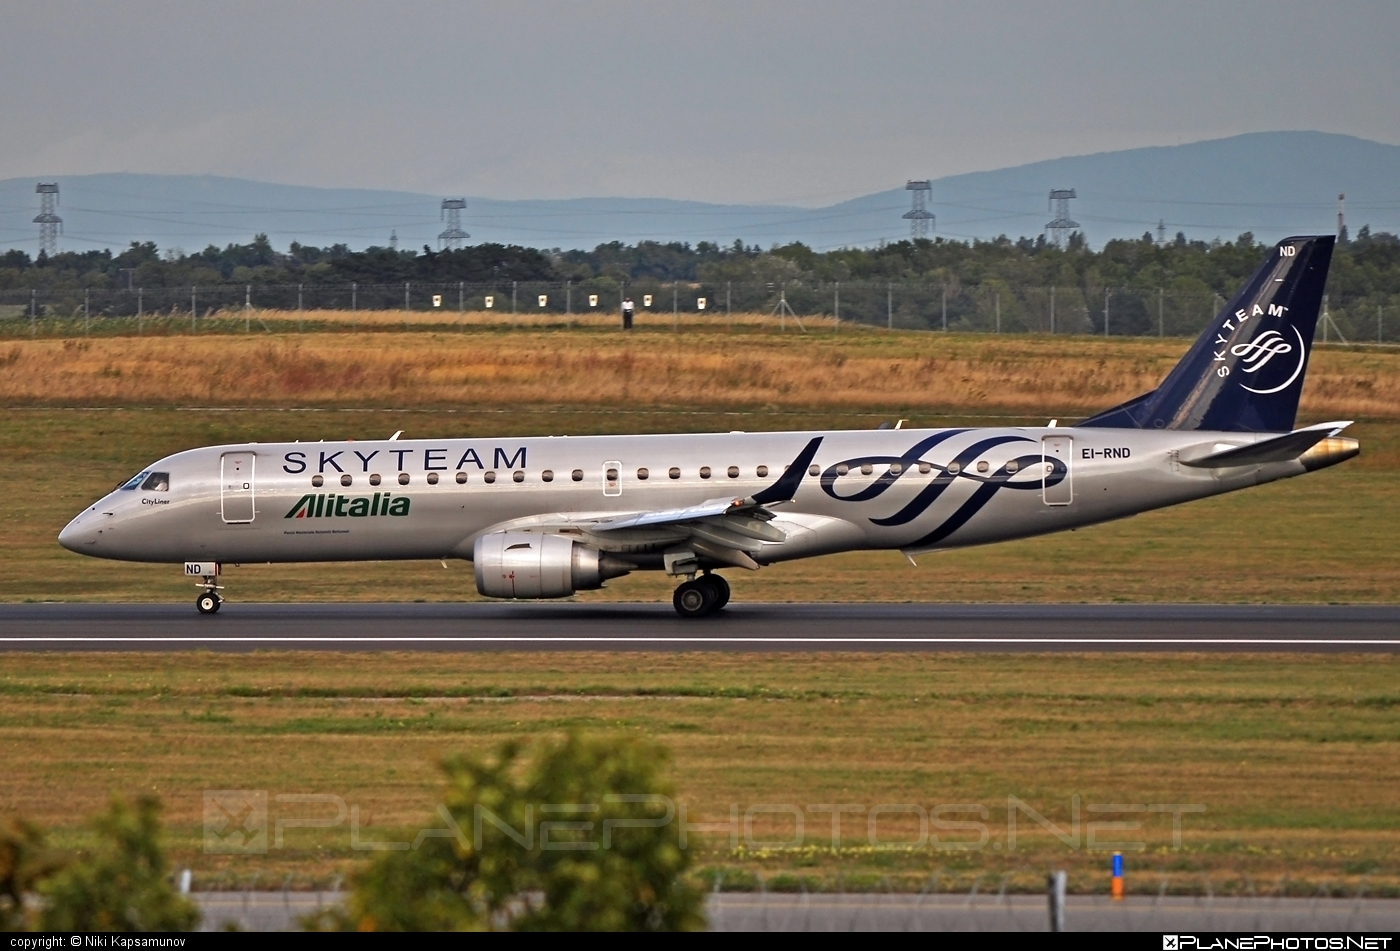 Embraer E190LR (ERJ-190-100LR) - EI-RND operated by Alitalia CityLiner #e190 #e190100 #e190100lr #e190lr #embraer #embraer190 #embraer190100lr #embraer190lr #skyteam